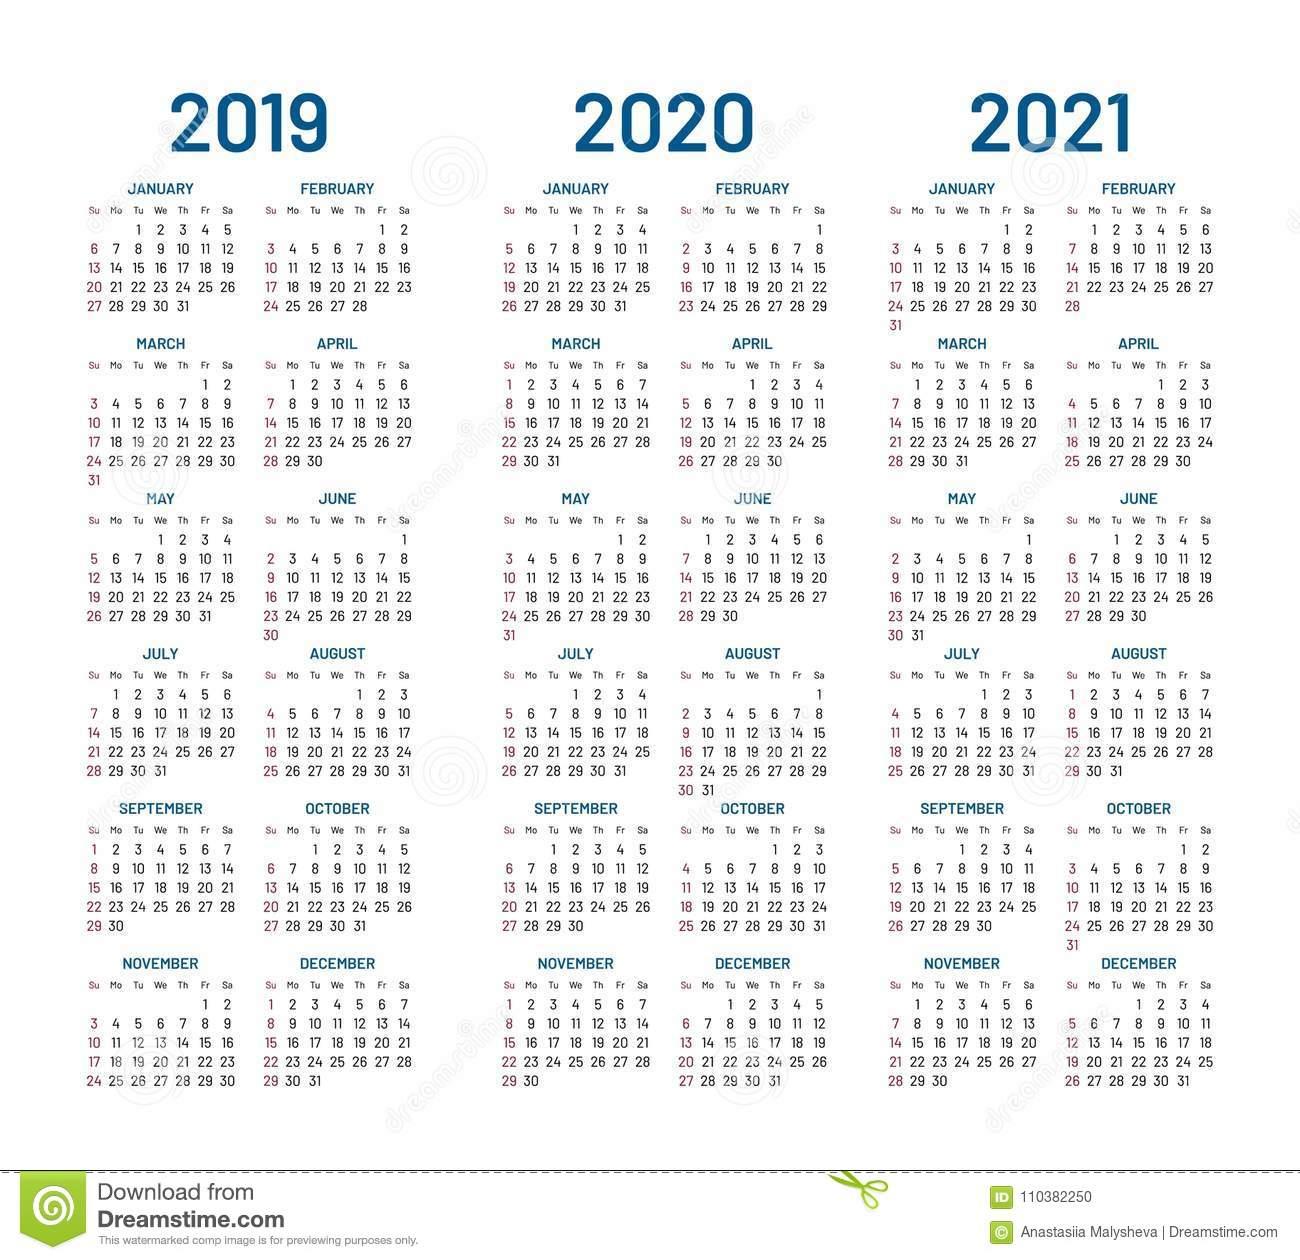 454 Retail Calendar 2019 Vs 2020 – Samyysandra Throughout 454 Calendar For 2020